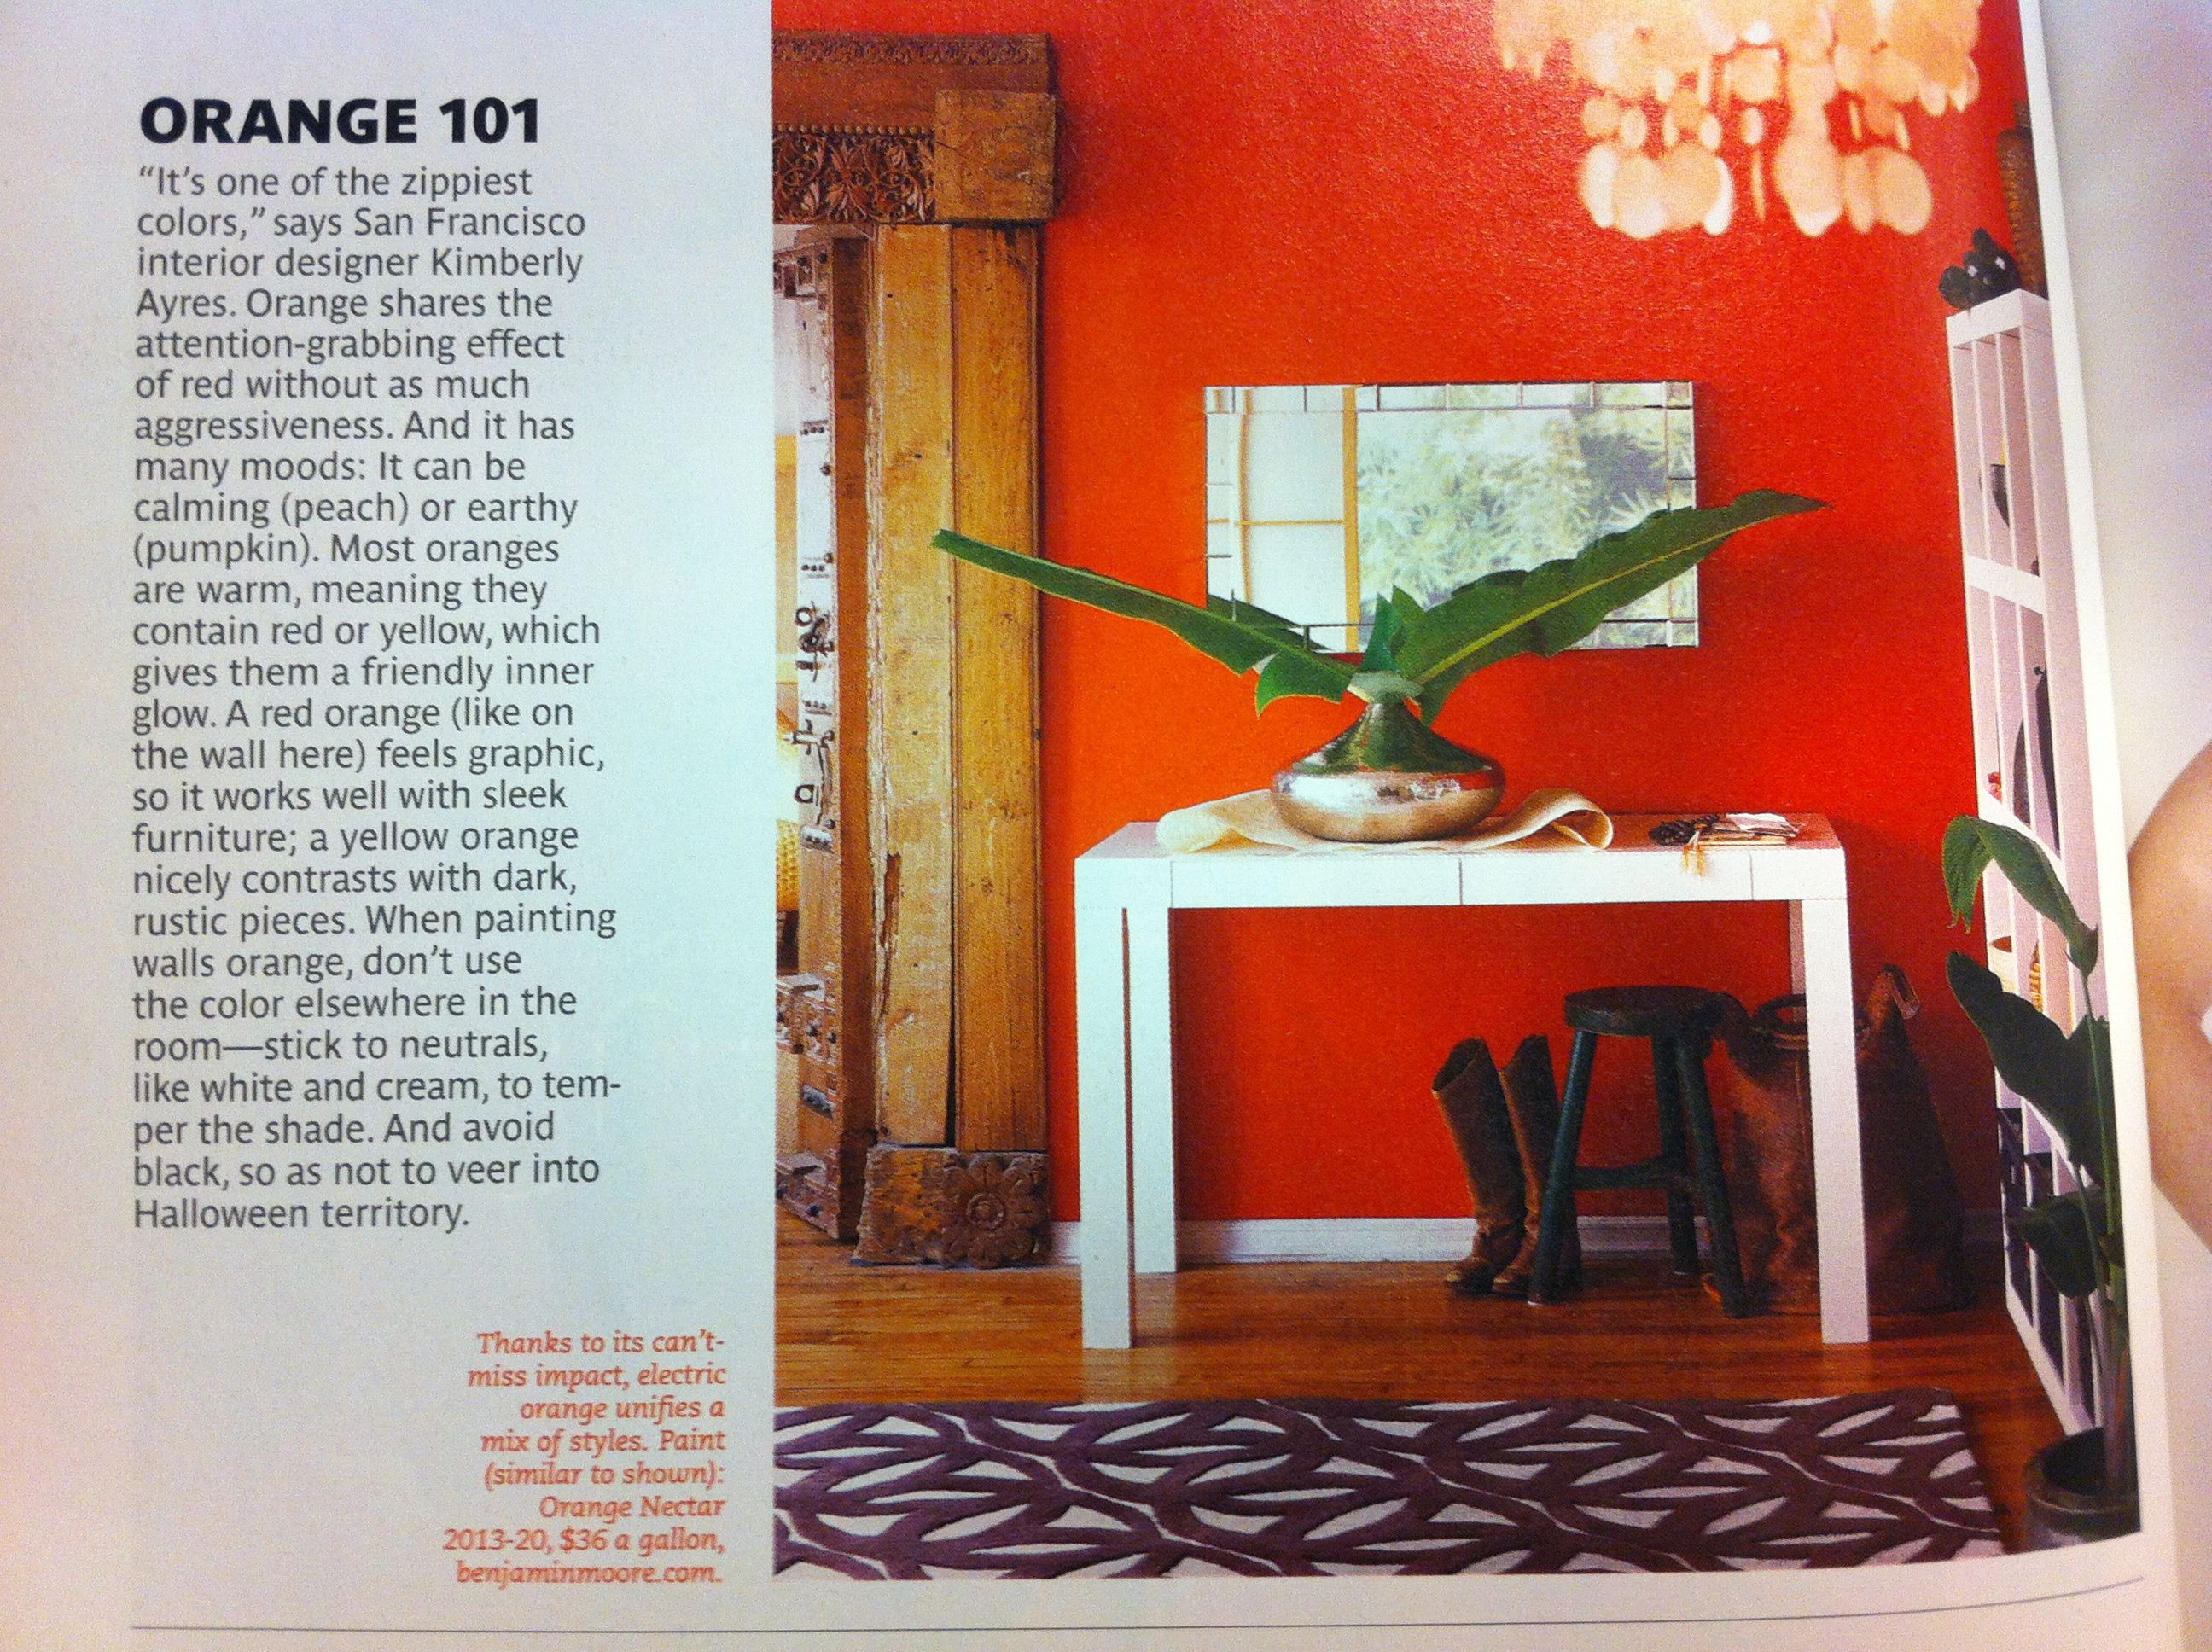 benjamin moore orange nectar walls | paint | pinterest | benjamin